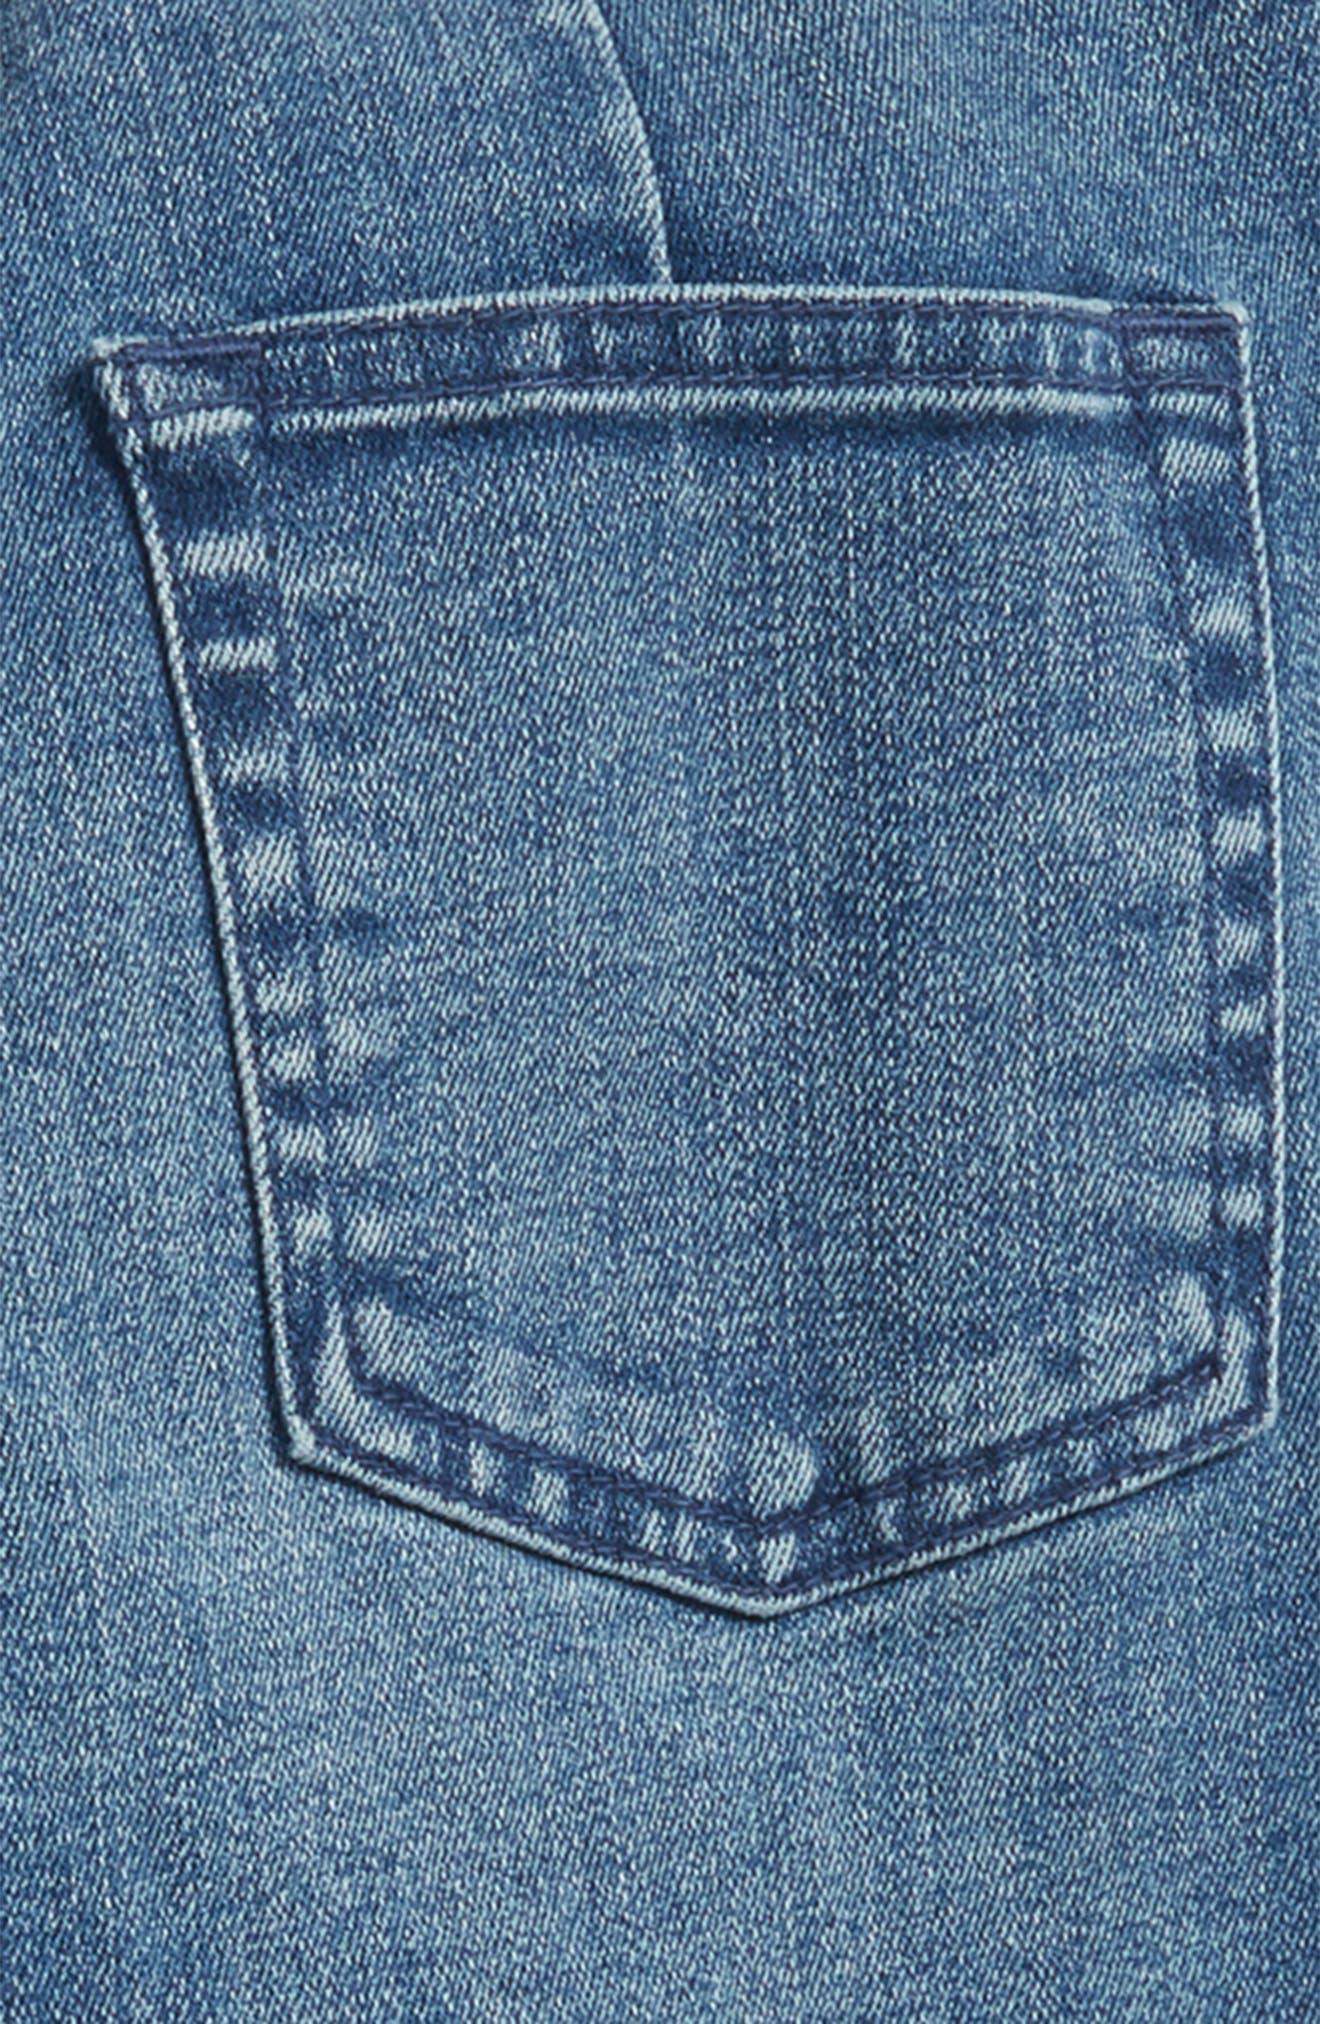 Pull-On Denim Pants,                             Alternate thumbnail 3, color,                             MEDIUM WASH